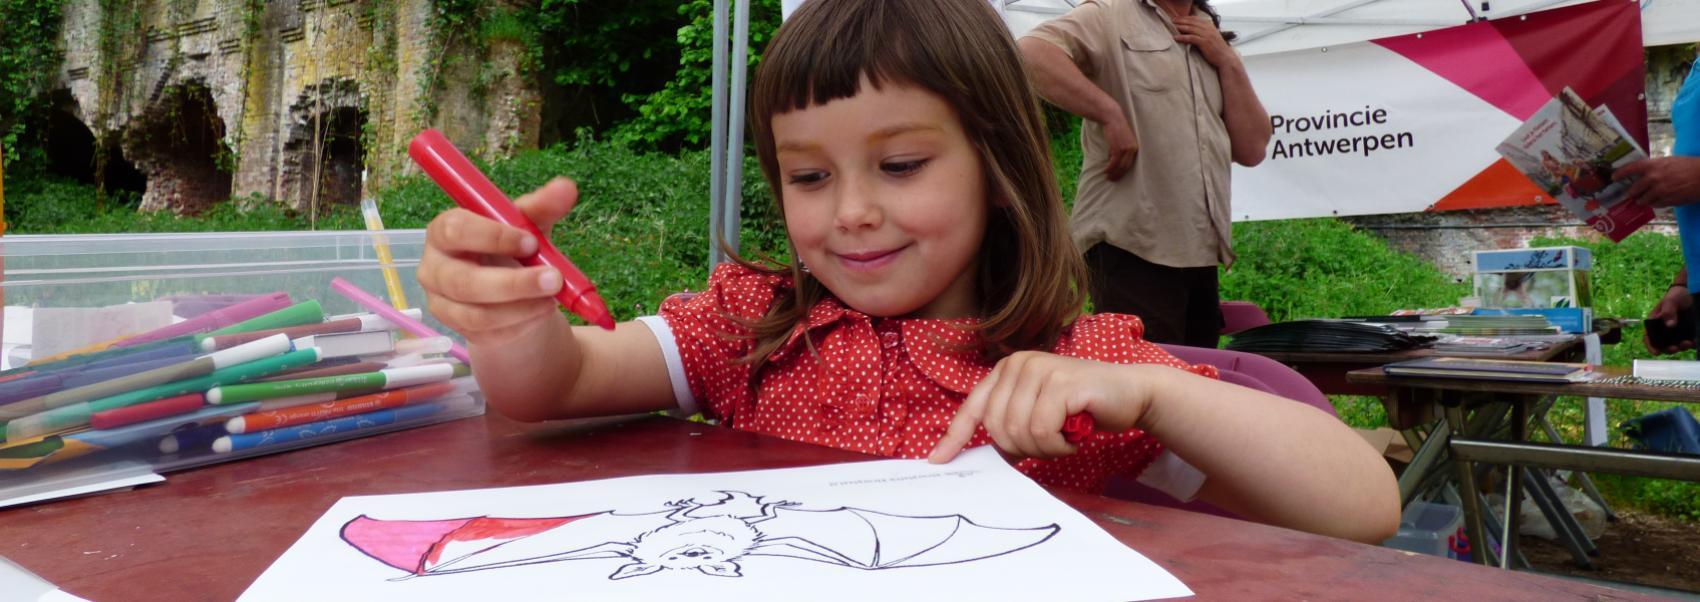 Fort Steendorp kind kleurt vleermuis